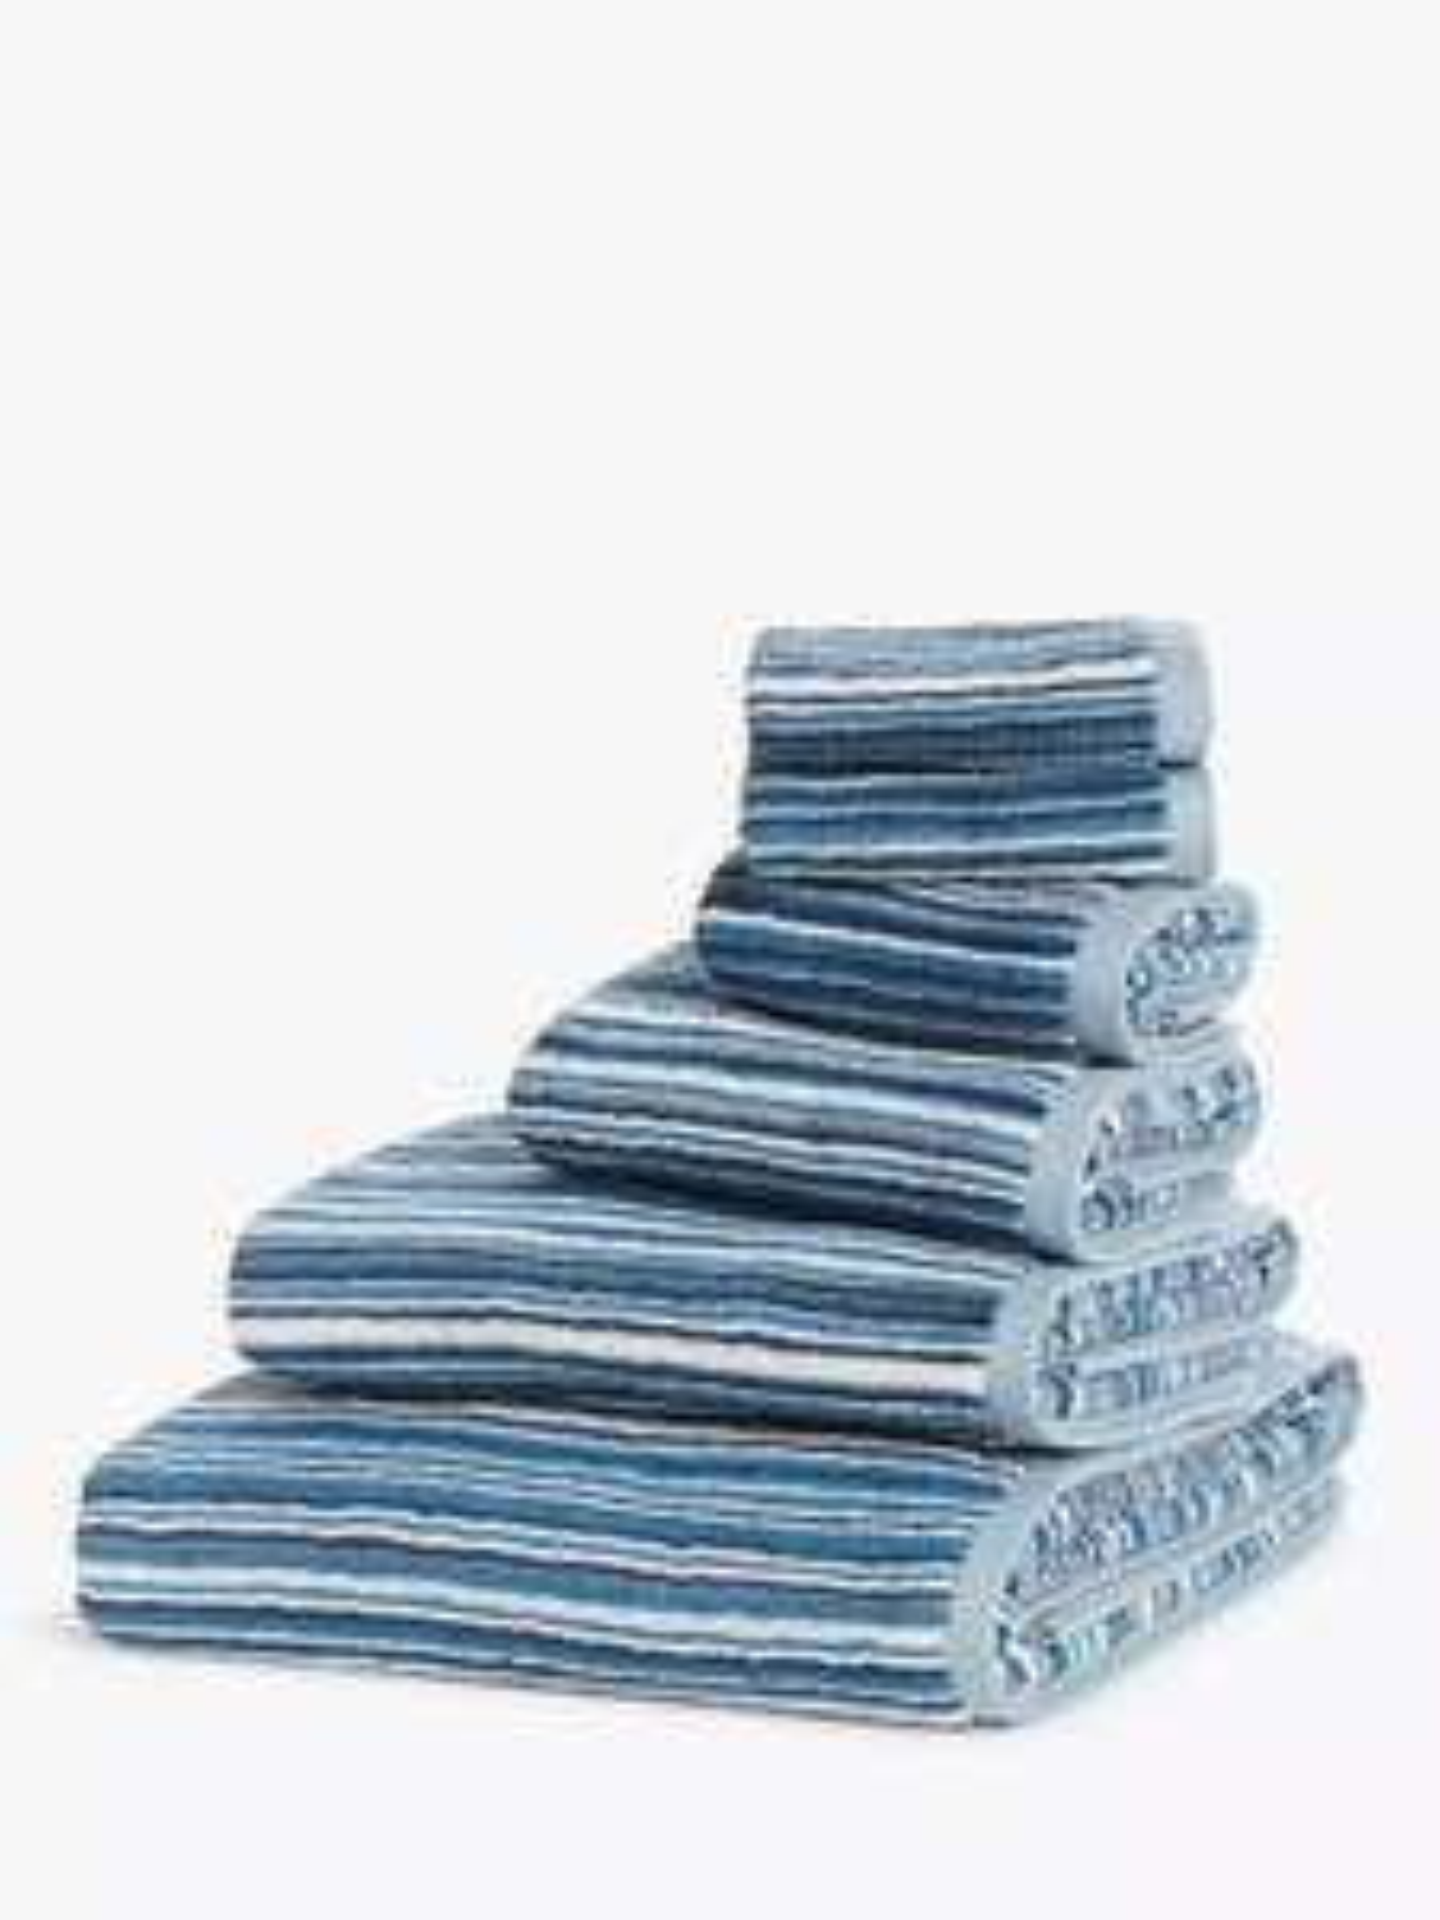 John Lewis & Partners Stripe Towels, Blue £3.00 - £8.00 + £3.50 del at @ John Lewis & Partners